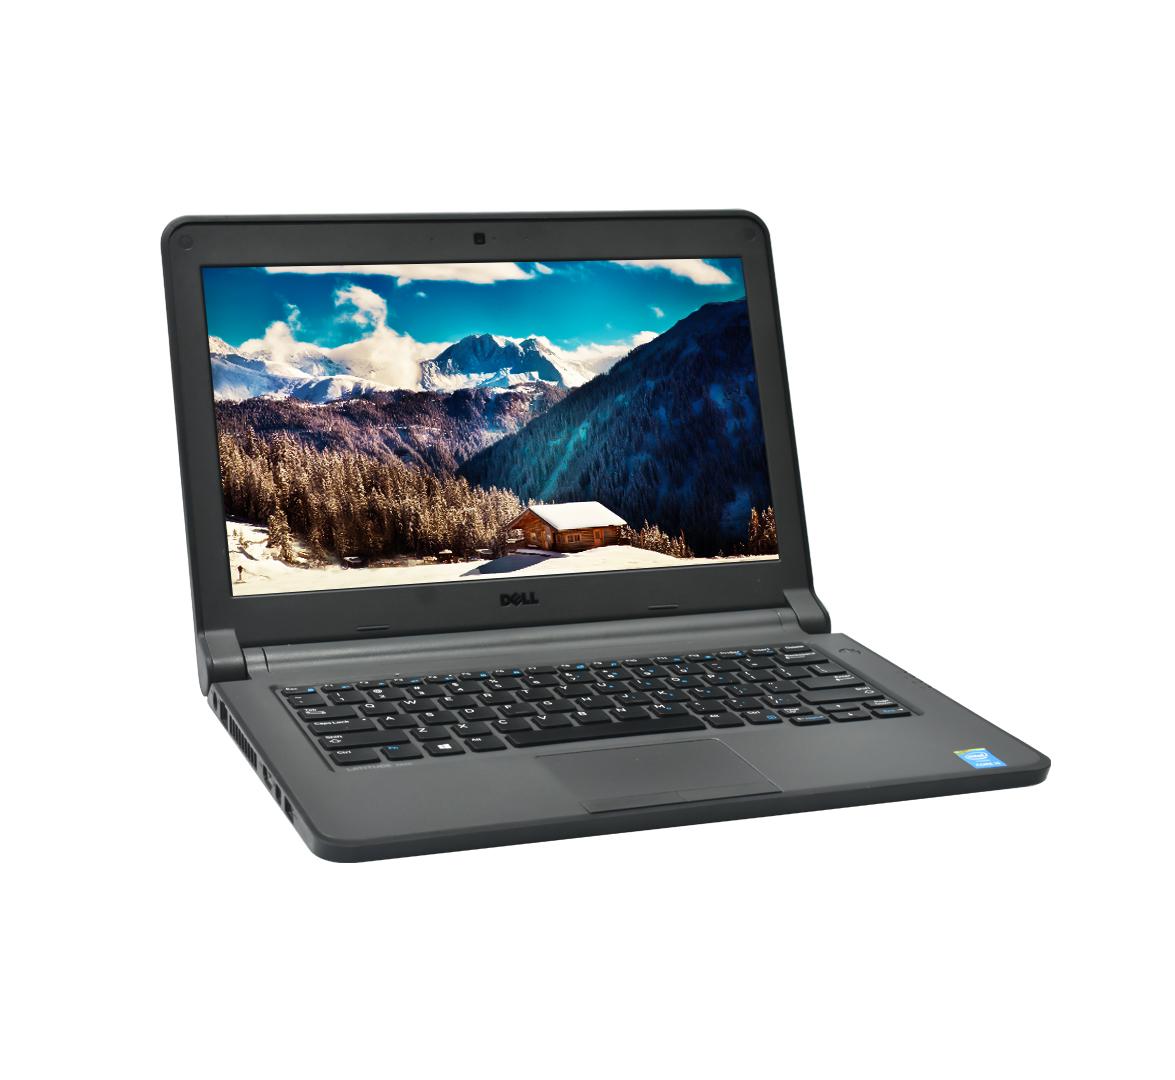 Dell latitude 3340 Business Laptop, Intel Core i5-4210U CPU, 8GB DDR3L SODIMM RAM, 250GB SATA 2.5 Hard, 13 inch Display, Windows 10 Pro (Refurbished)